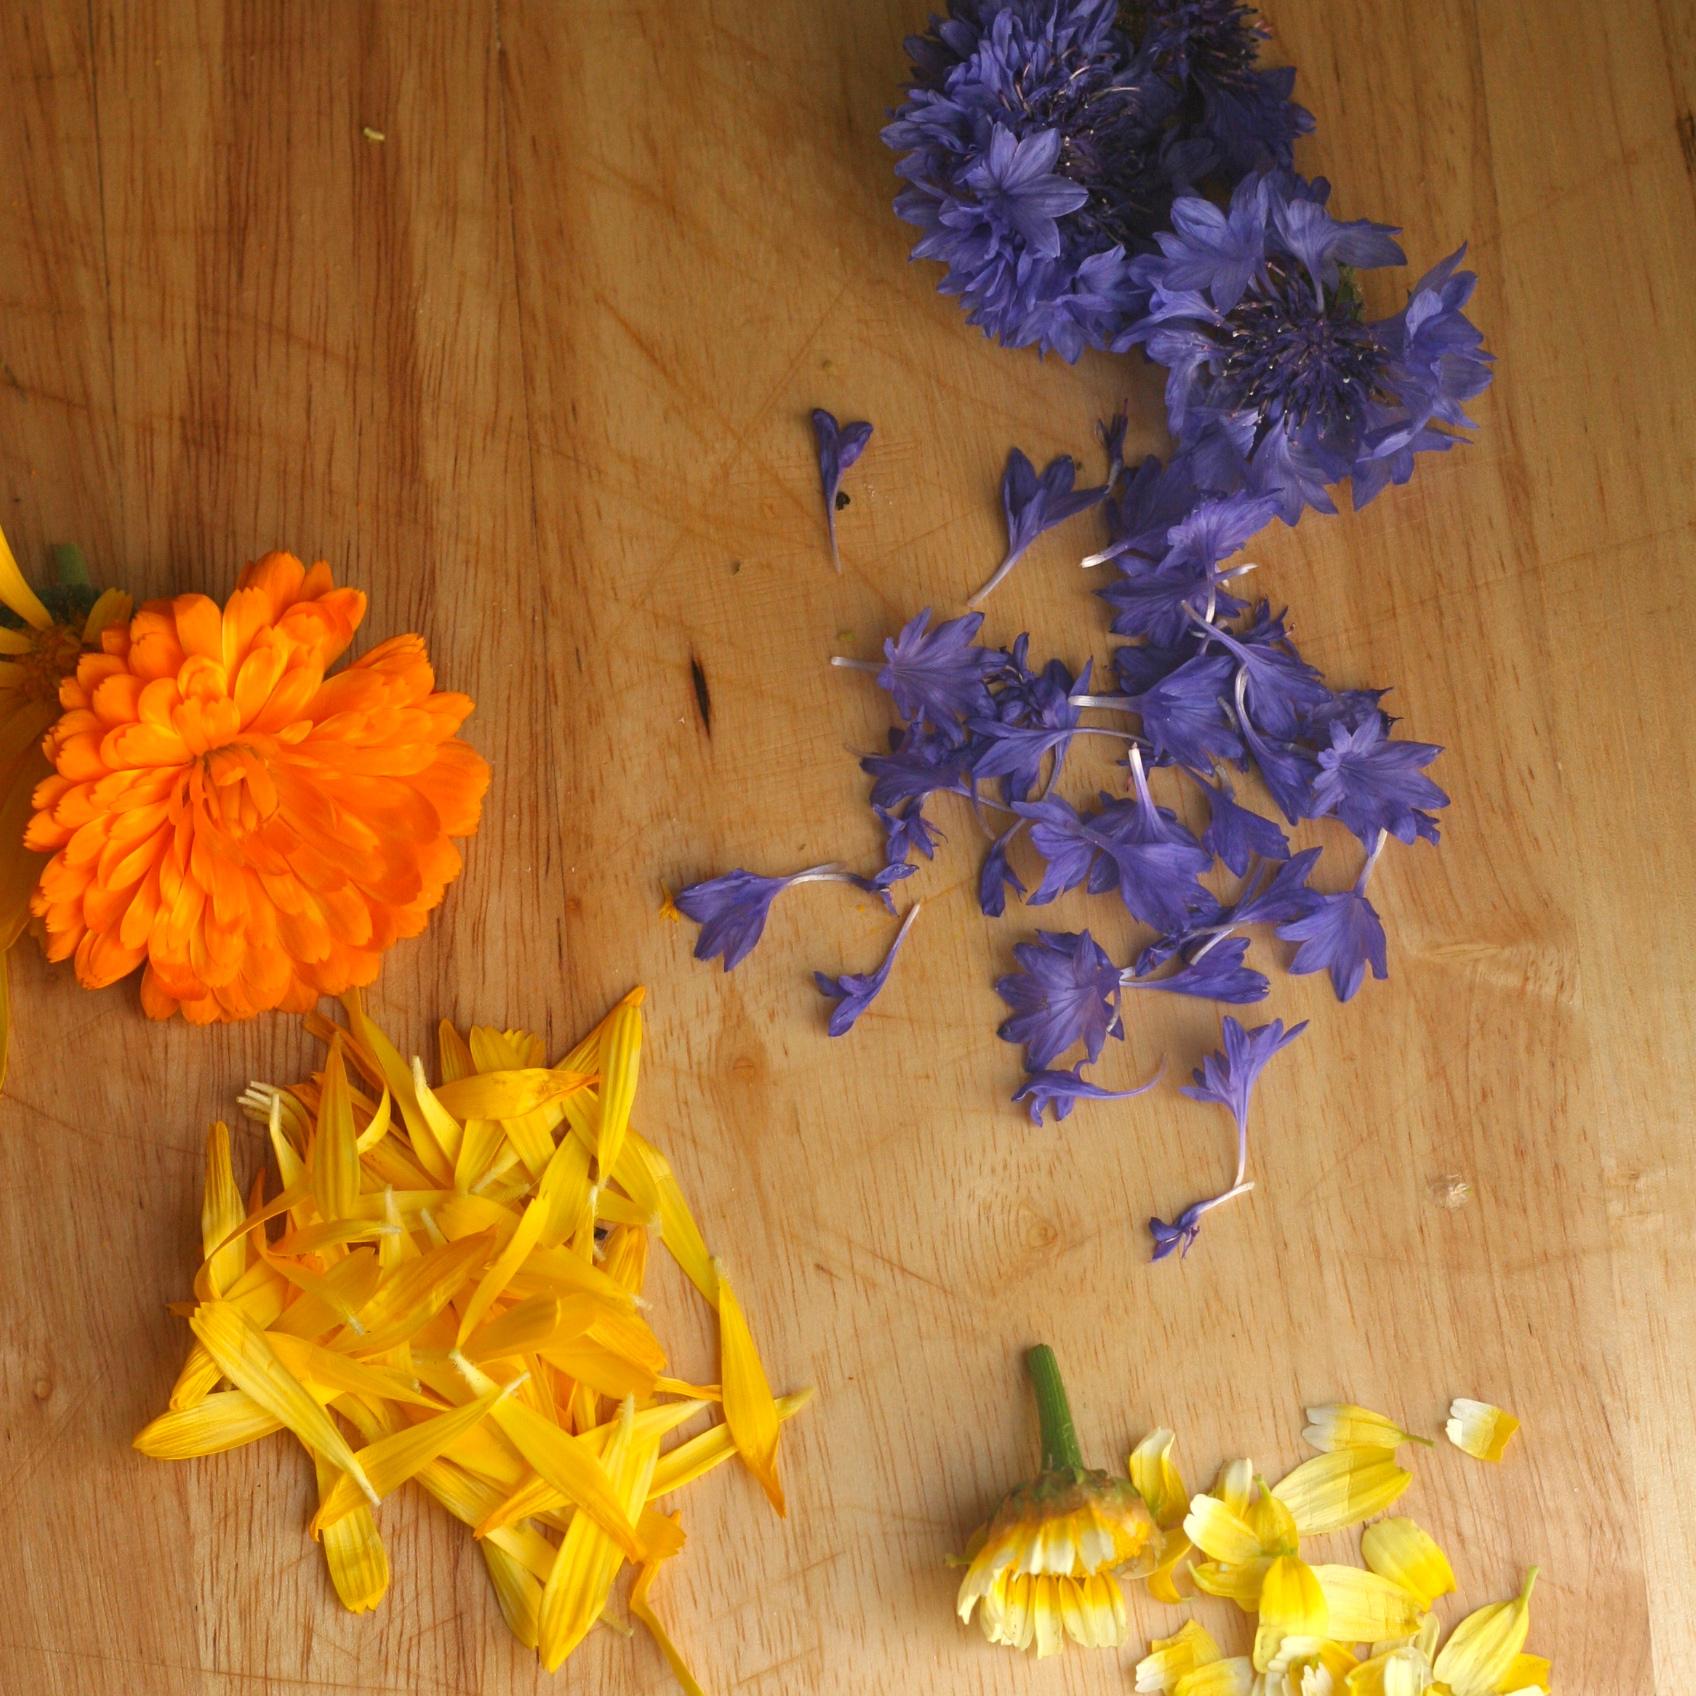 Edible flower petals - Calendula and Cornflower for pressed flower cake